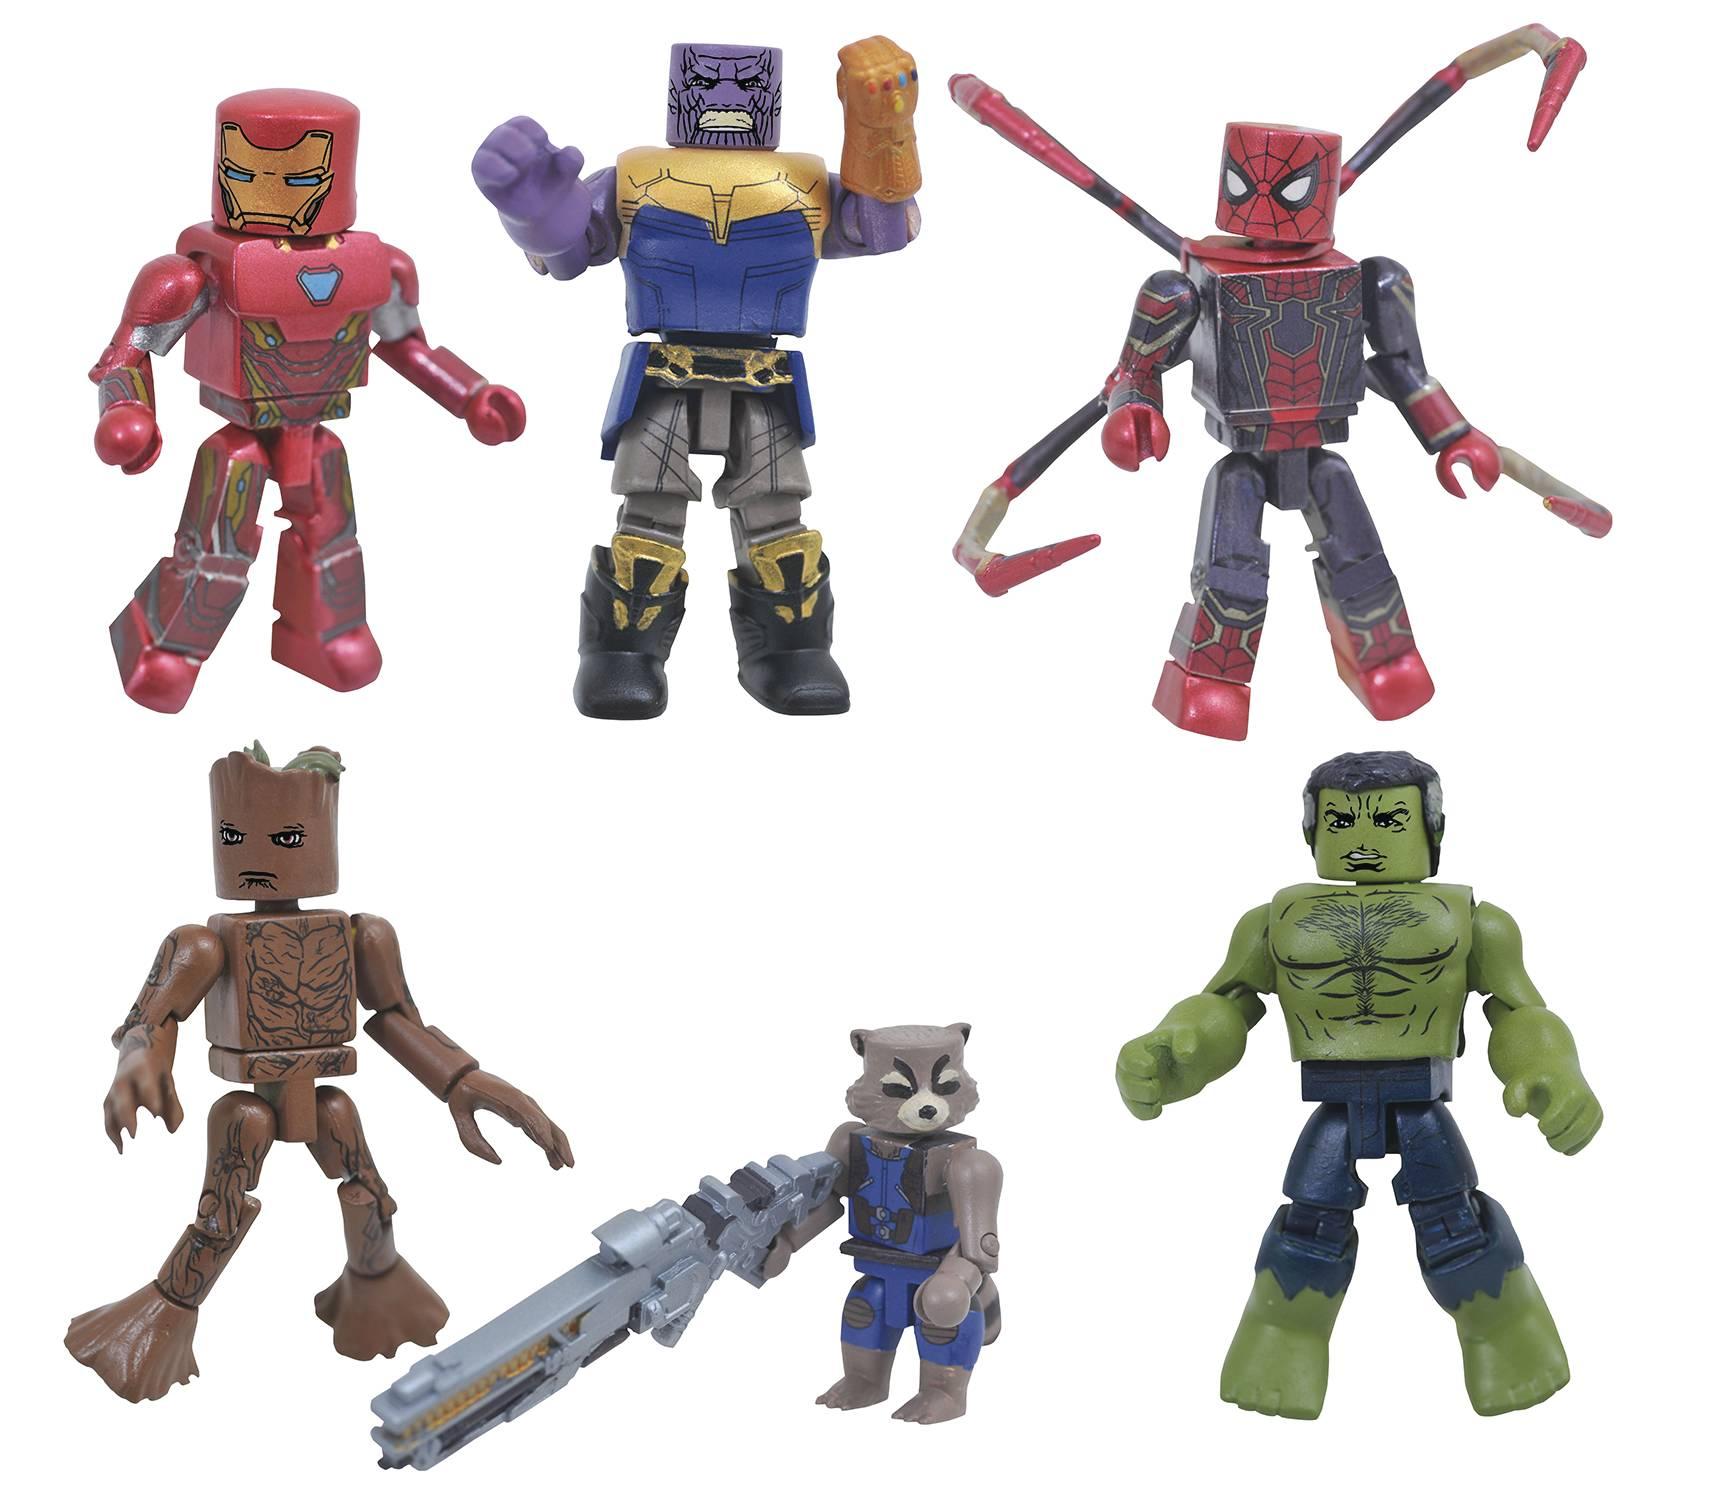 Minimates Avengers 3 series. 1